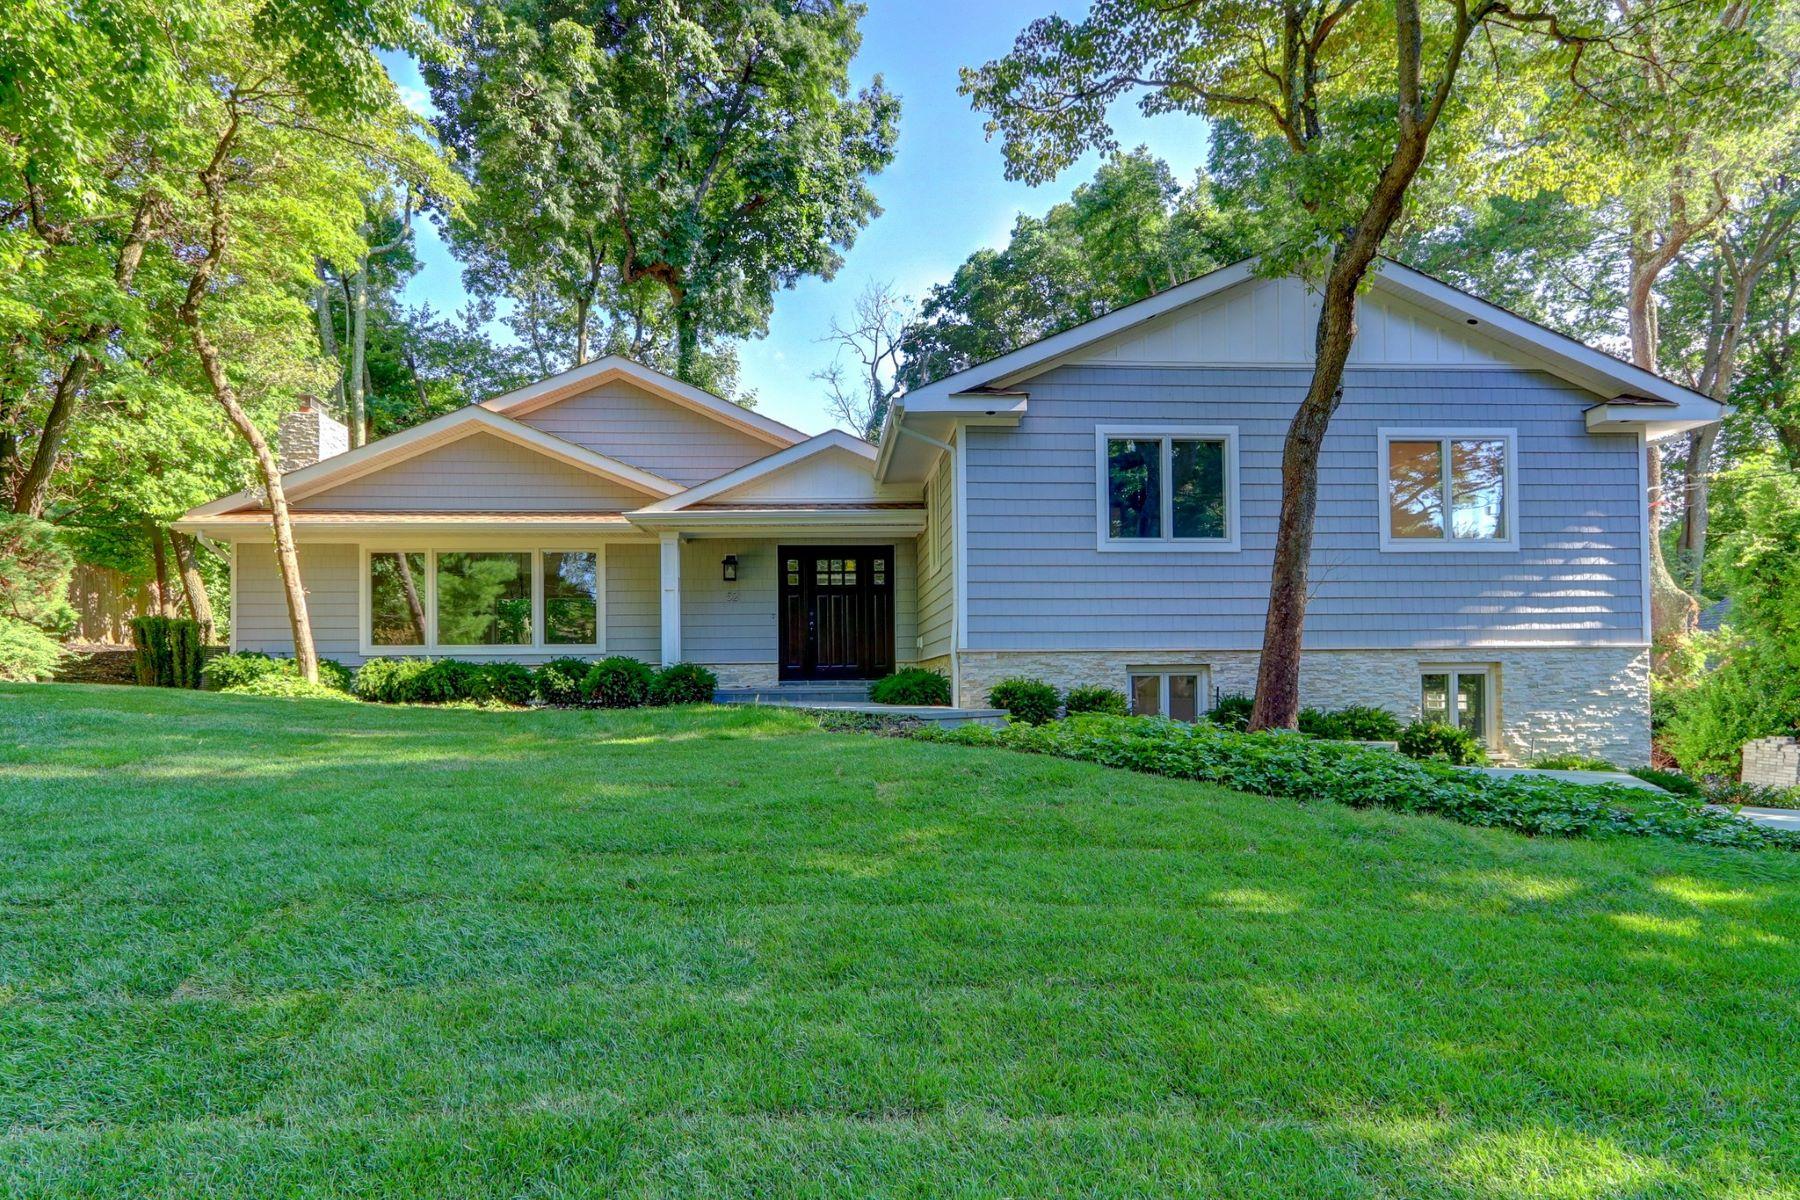 Single Family Homes for Active at Roslyn Estates 52 The Hemlocks Roslyn Estates, New York 11576 United States